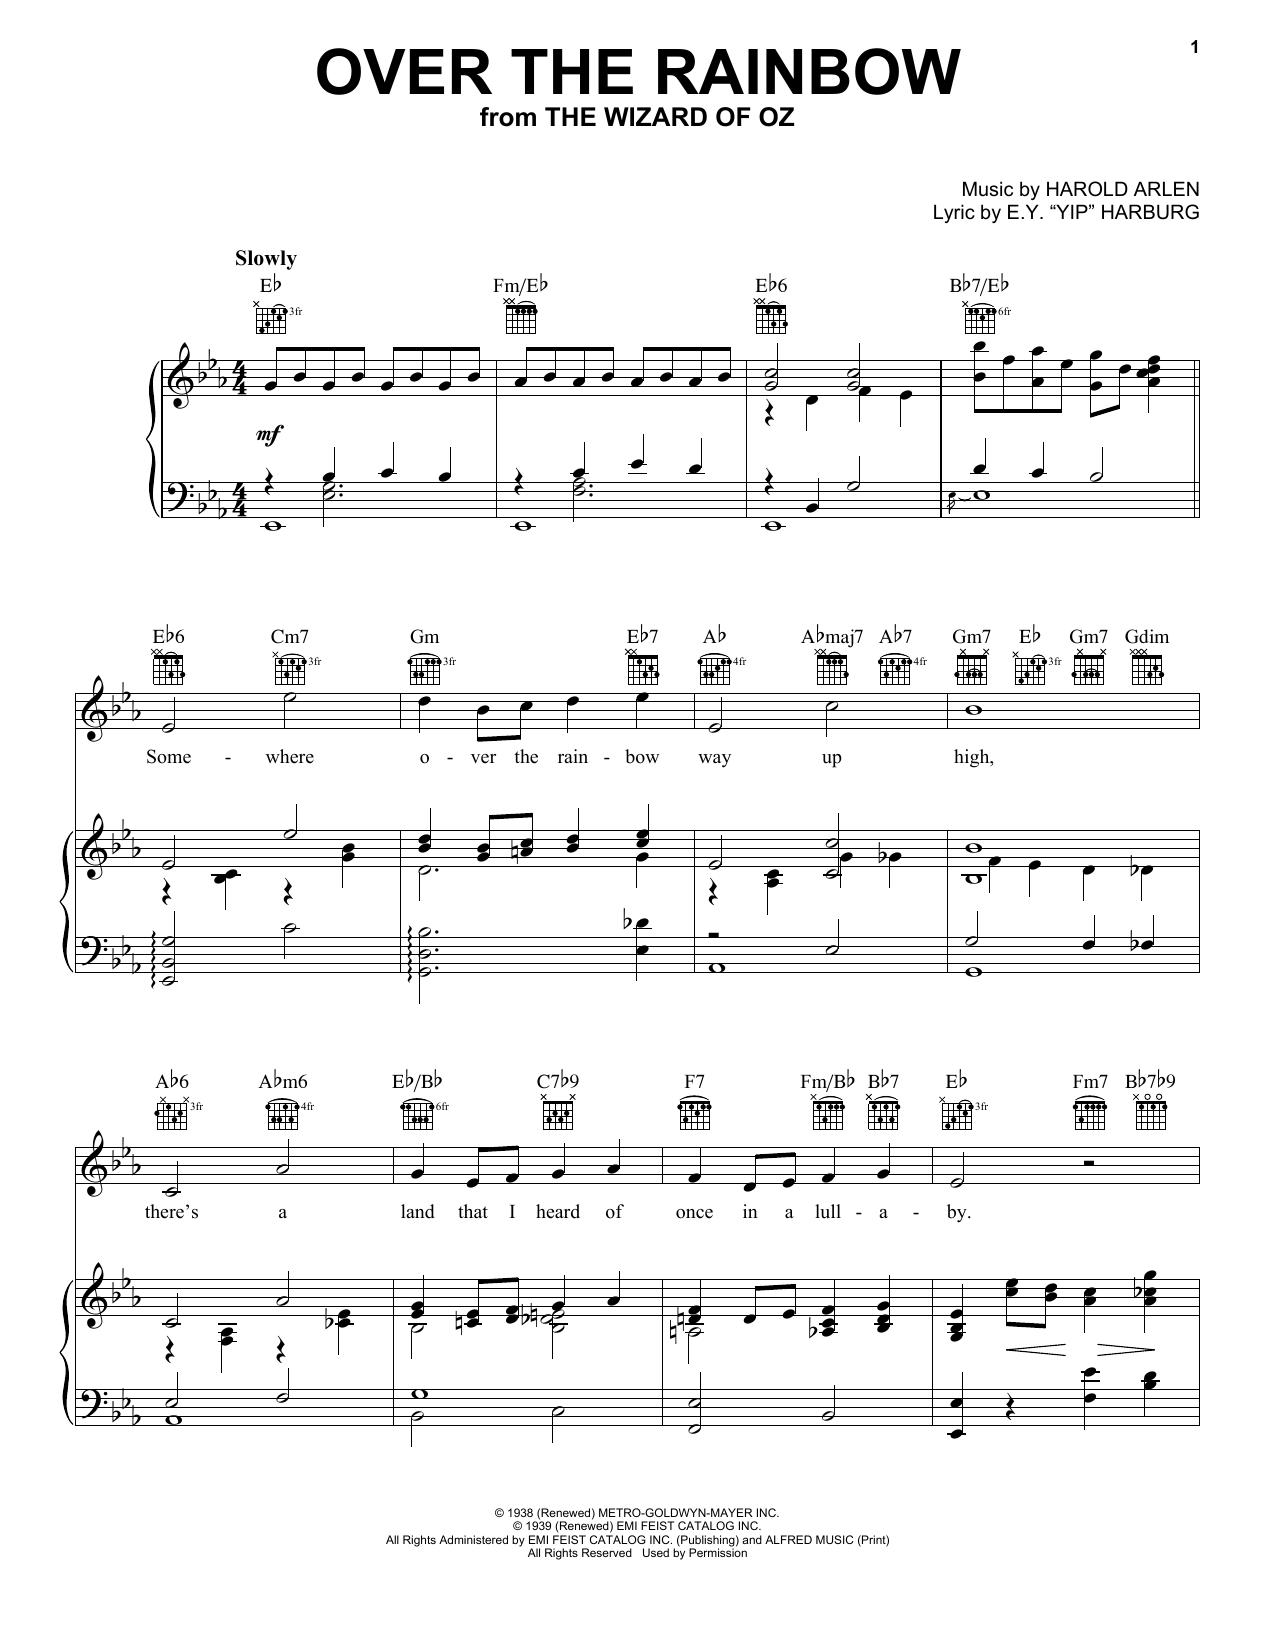 Over The Rainbow Harry Nilsson Sheet music, Guitar